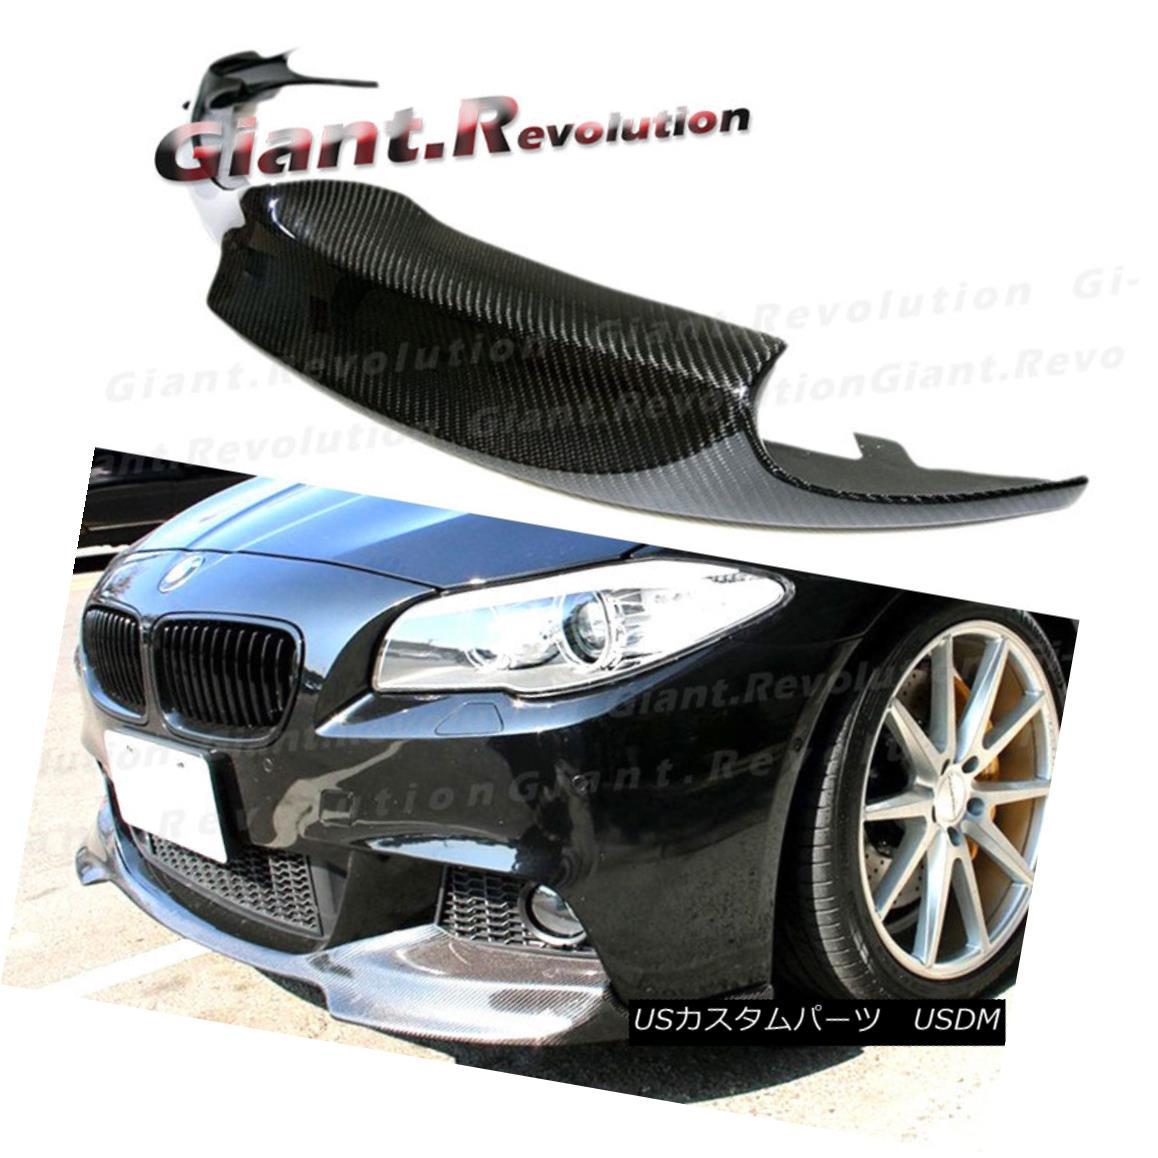 Add-On Sport F10 BMW Mスポーツバンパー F10 BMW エアロパーツ V Type Bumper Fiber Vタイプカーボンファイバーフロントバンパーアドオンリップフィット2011-2015 Bumper 2011-2015 M Fit Front Lip Carbon